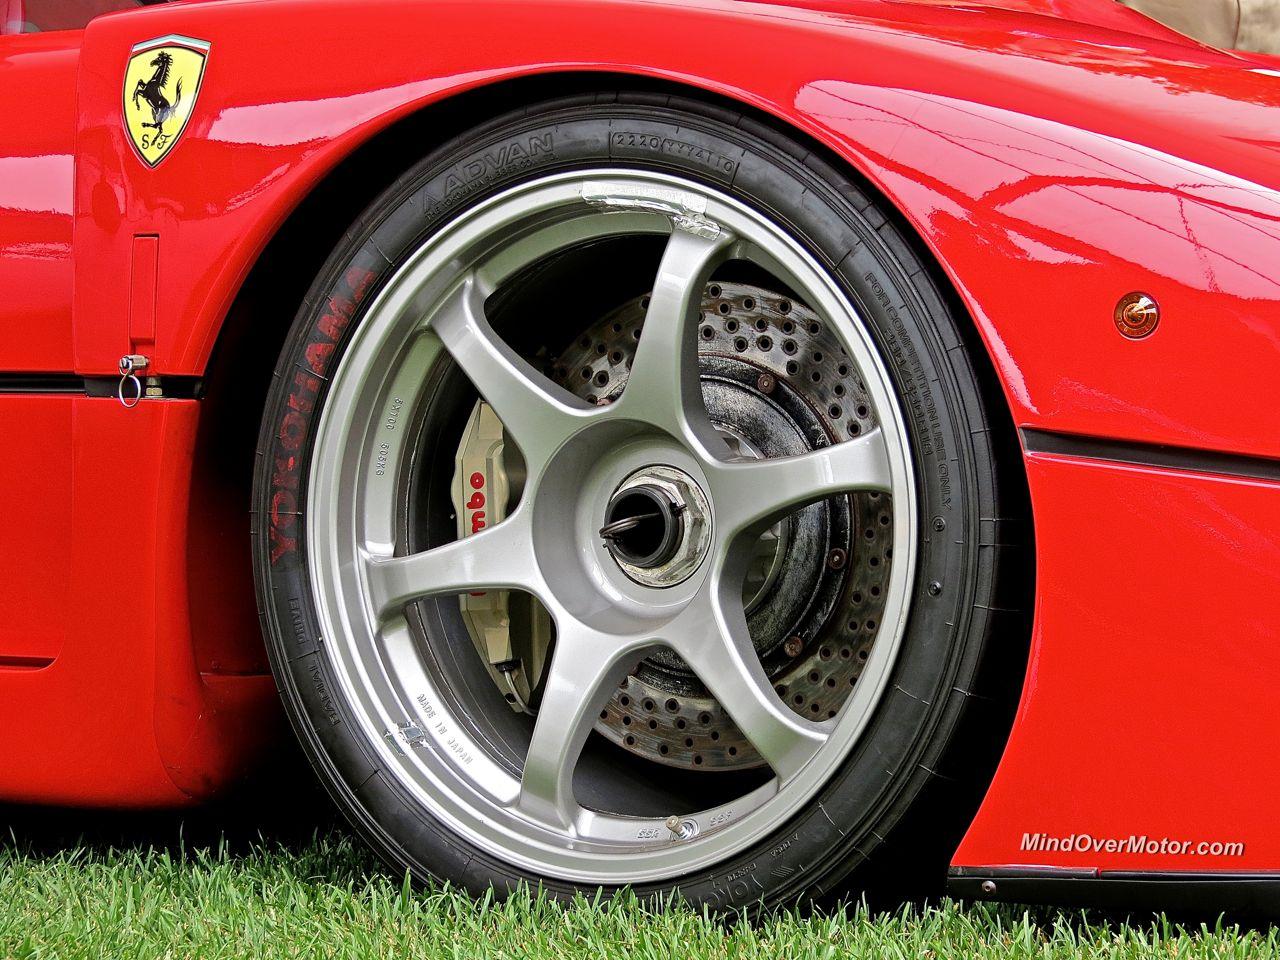 Ferrari F40 LM Wheel